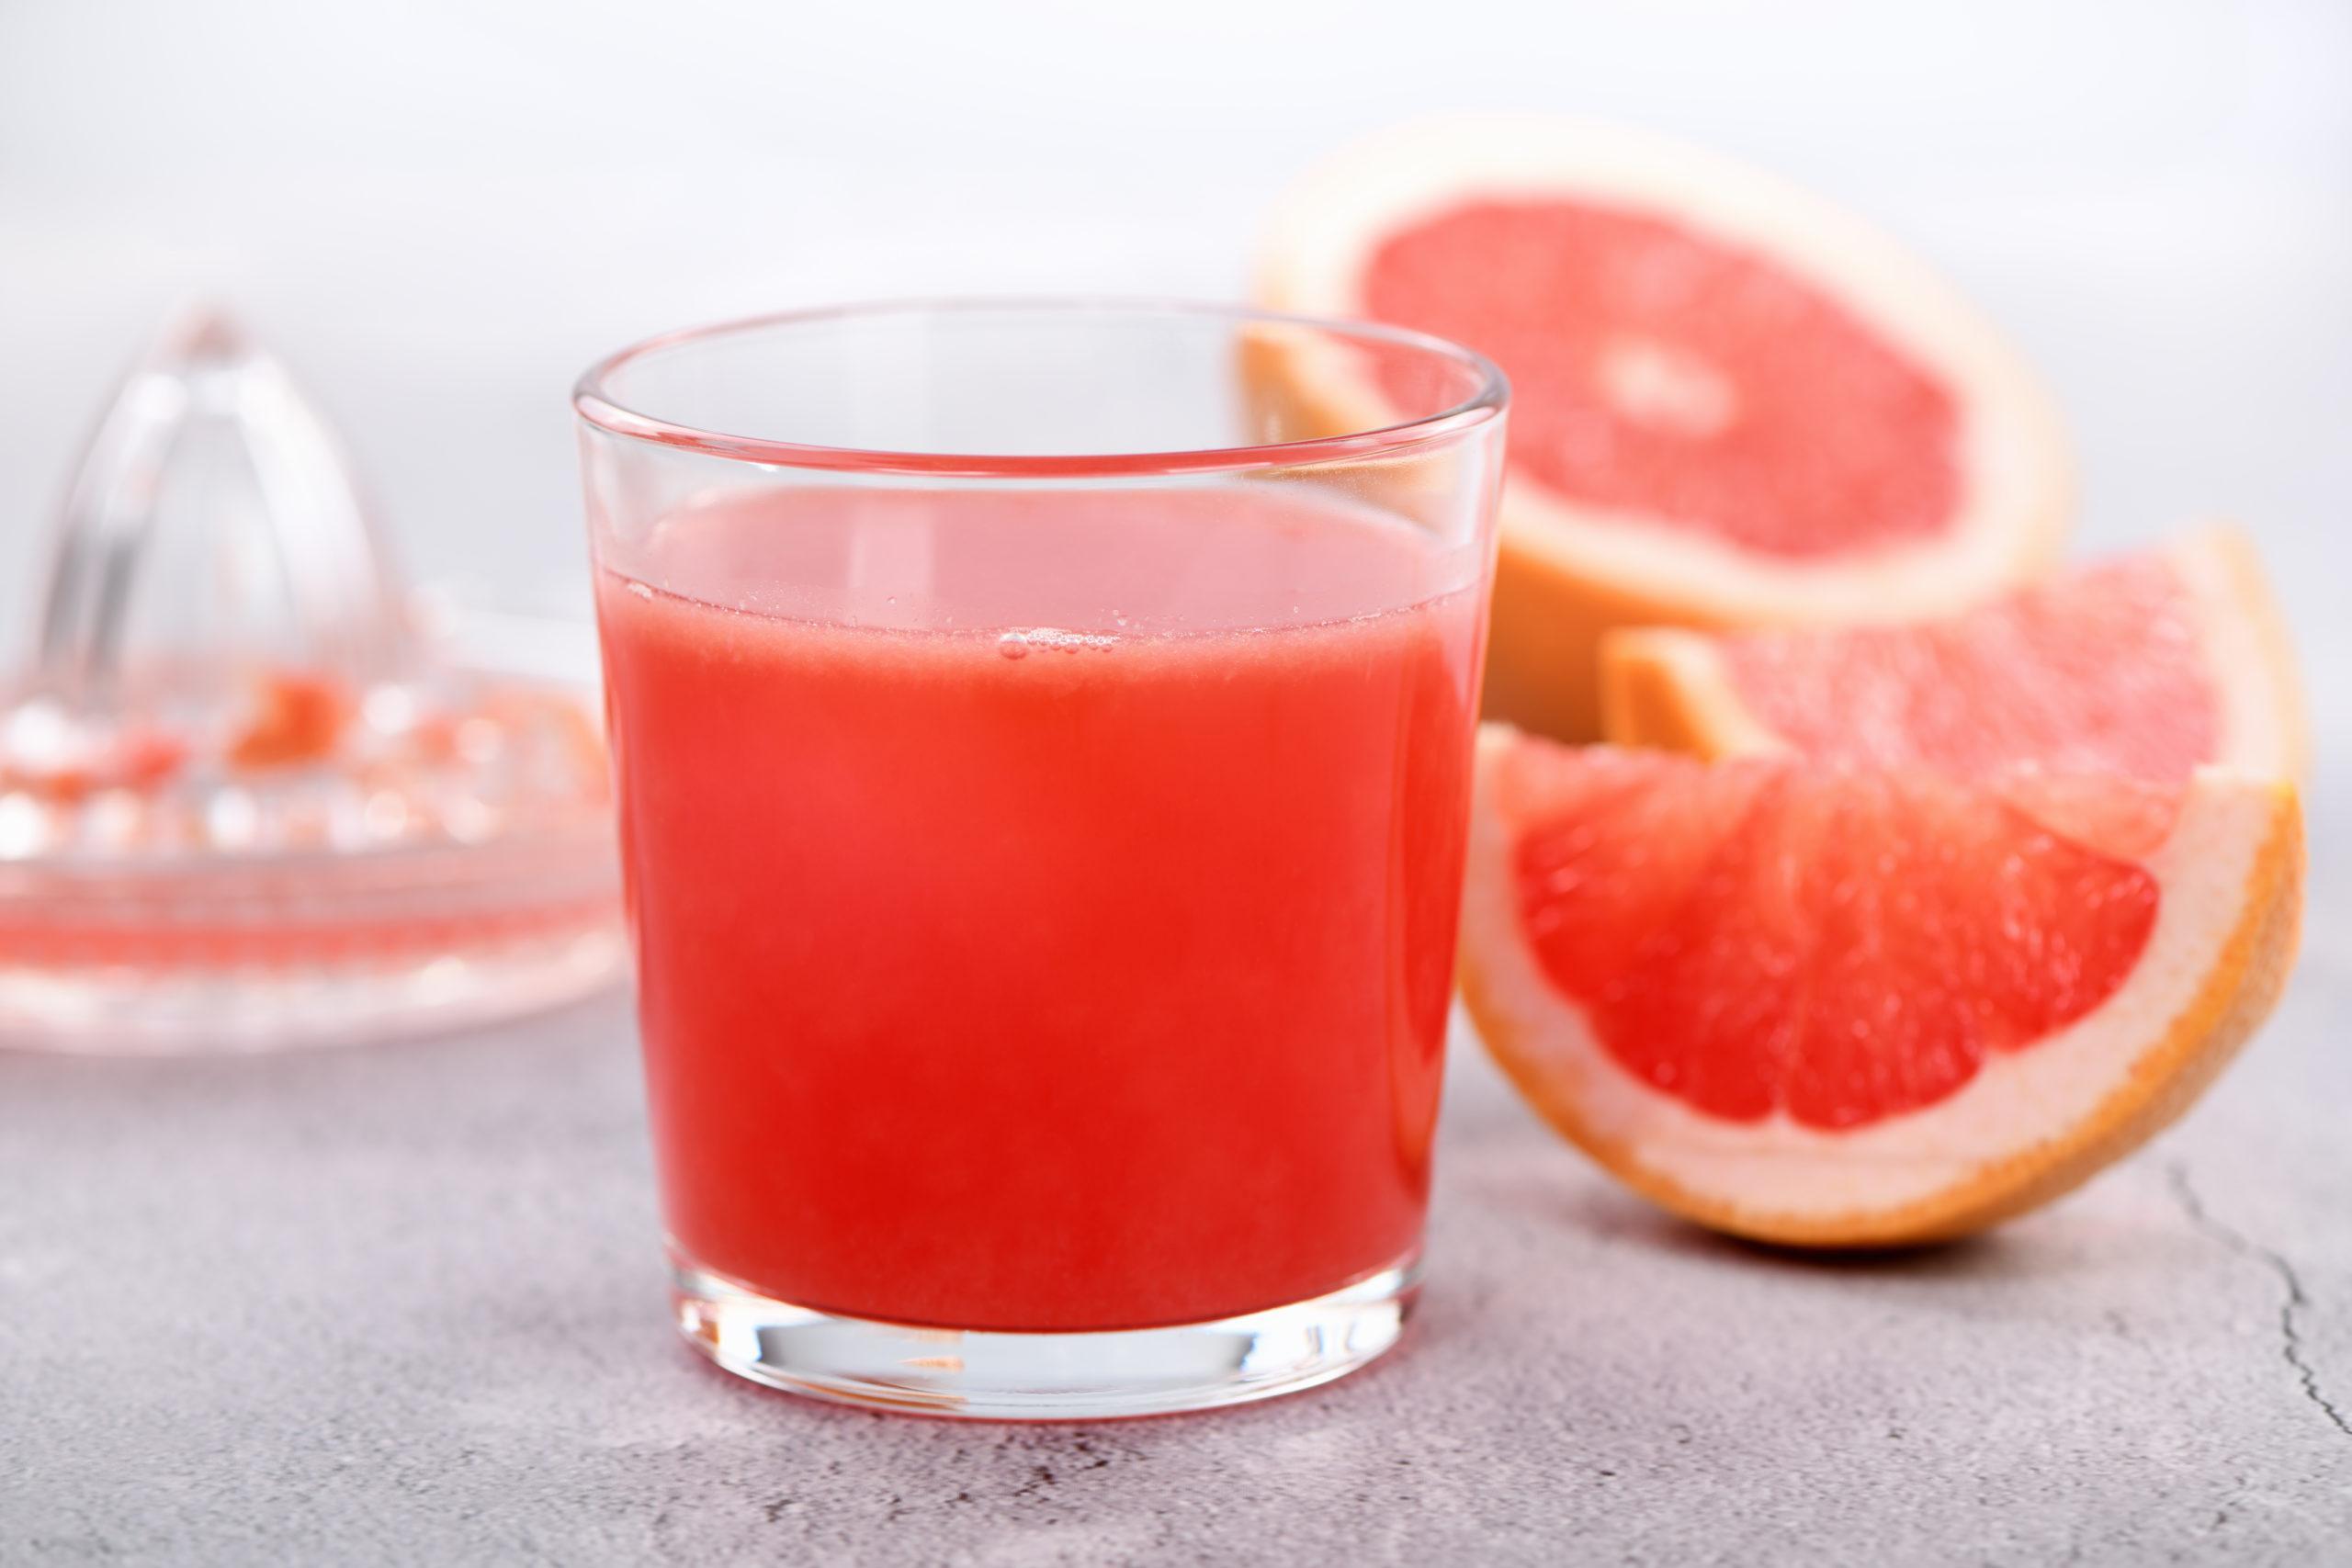 Marukan Apple Cider Vinegar Grapefruit Drink